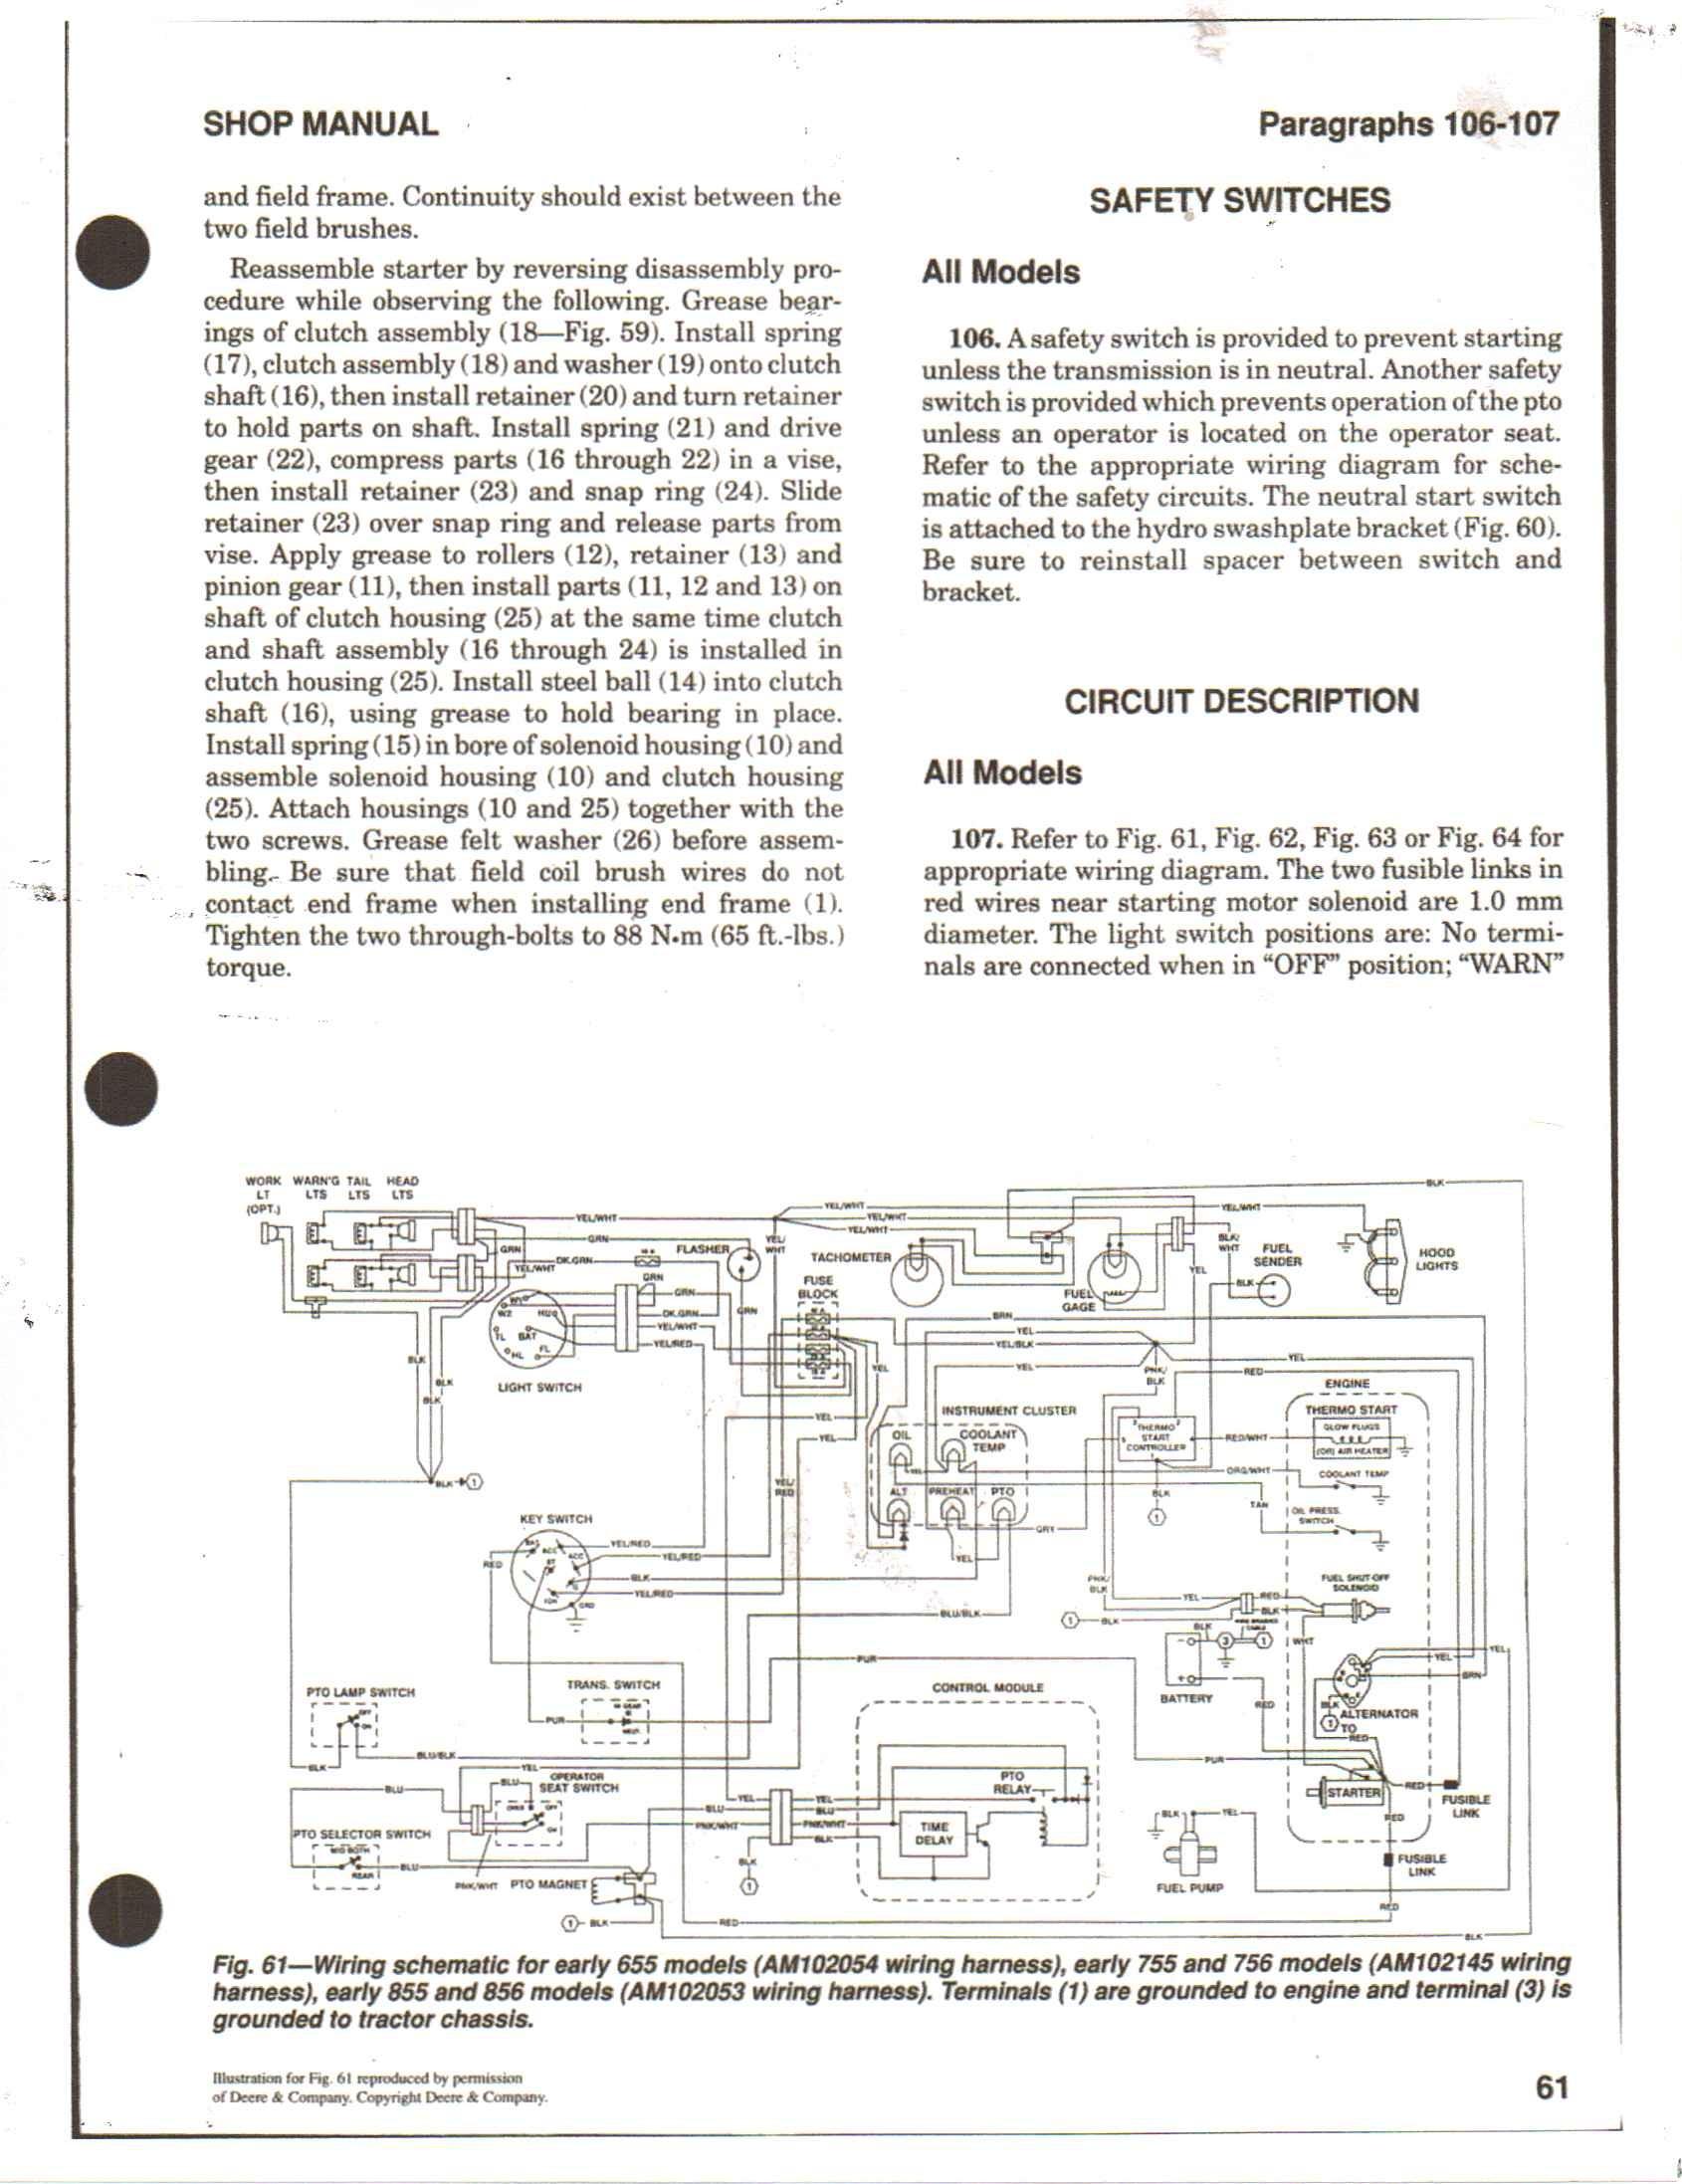 John Deere 318 Wiring Diagram Pdf 56d25 John Deere 655 Wiring Diagram Of John Deere 318 Wiring Diagram Pdf 56d25 John Deere 655 Wiring Diagram